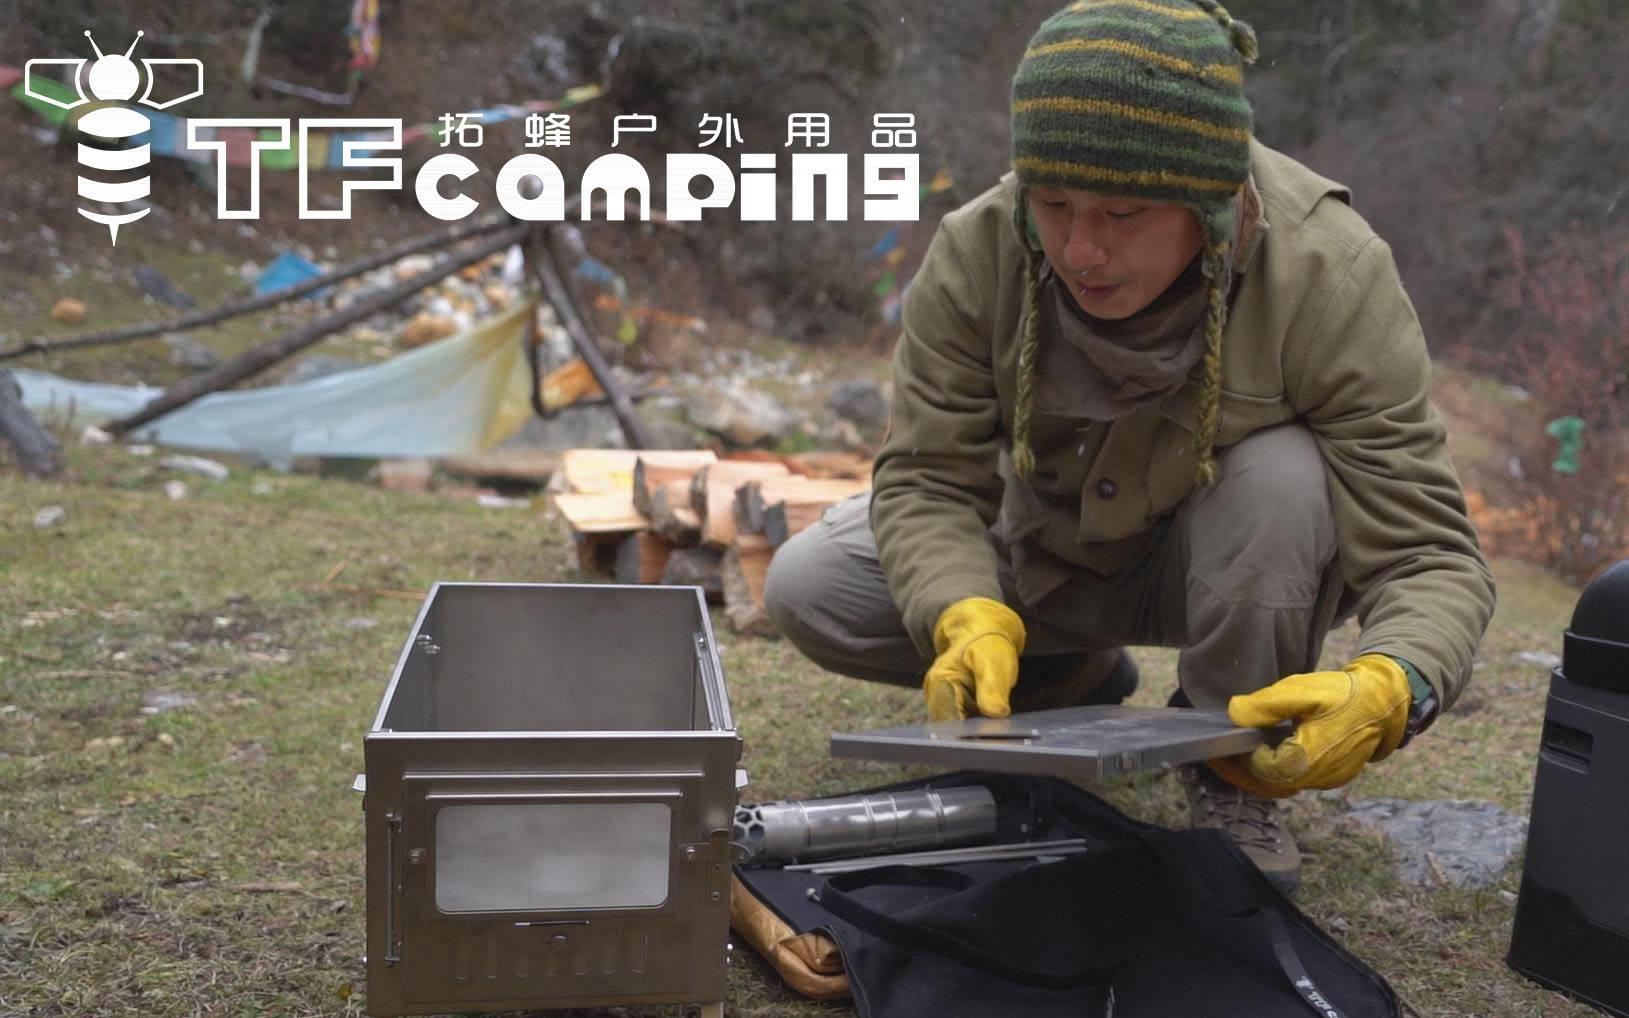 【A站首发】野外露营天气变幻莫测,你一定要带上它——拓蜂户外炉